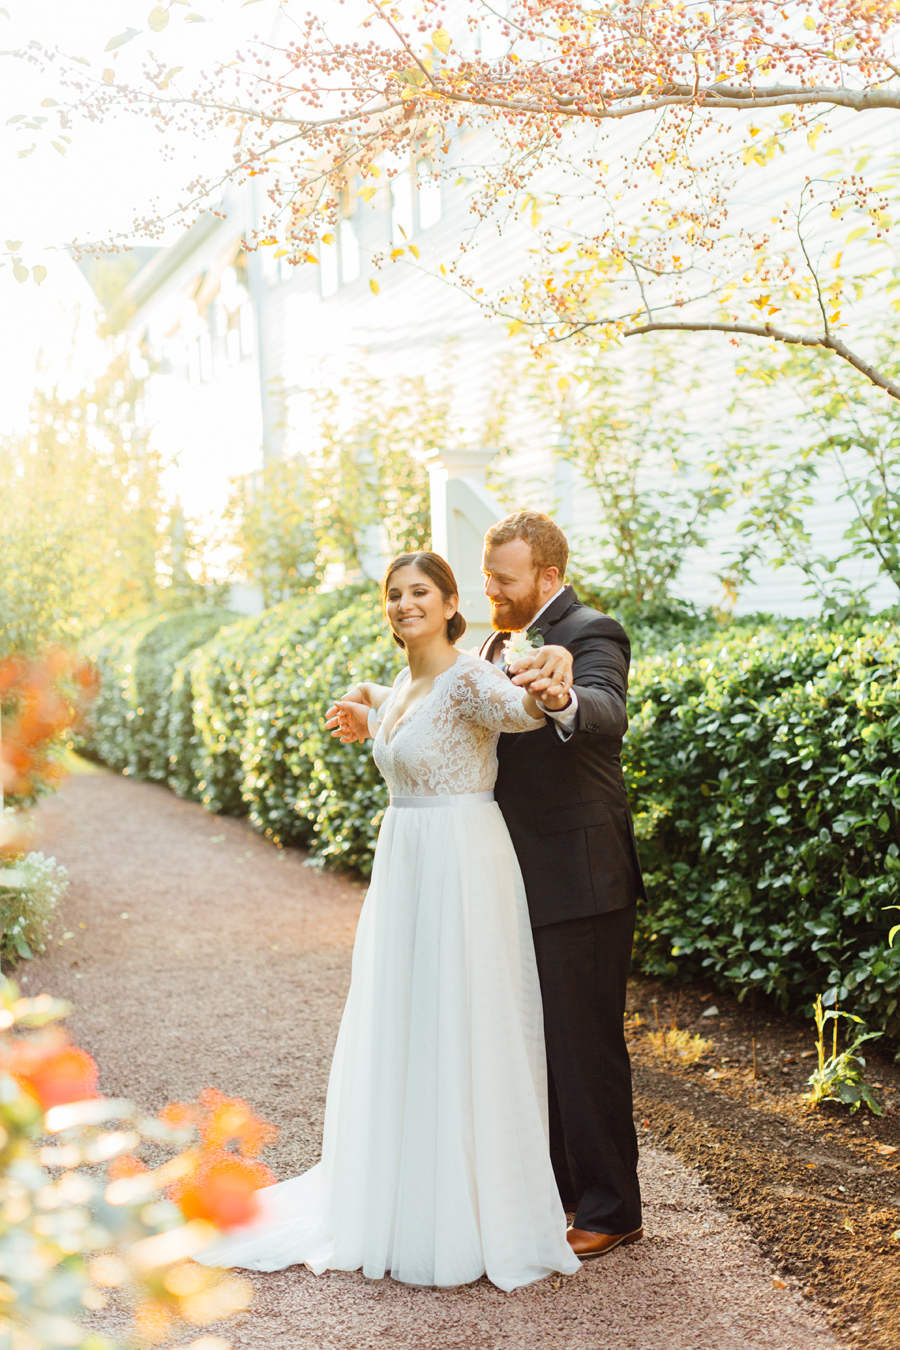 the-inn-at-leola-wedding-lancaster-pennsylvania-wedding-photographer-rebeka-viola-photograhy (86).jpg